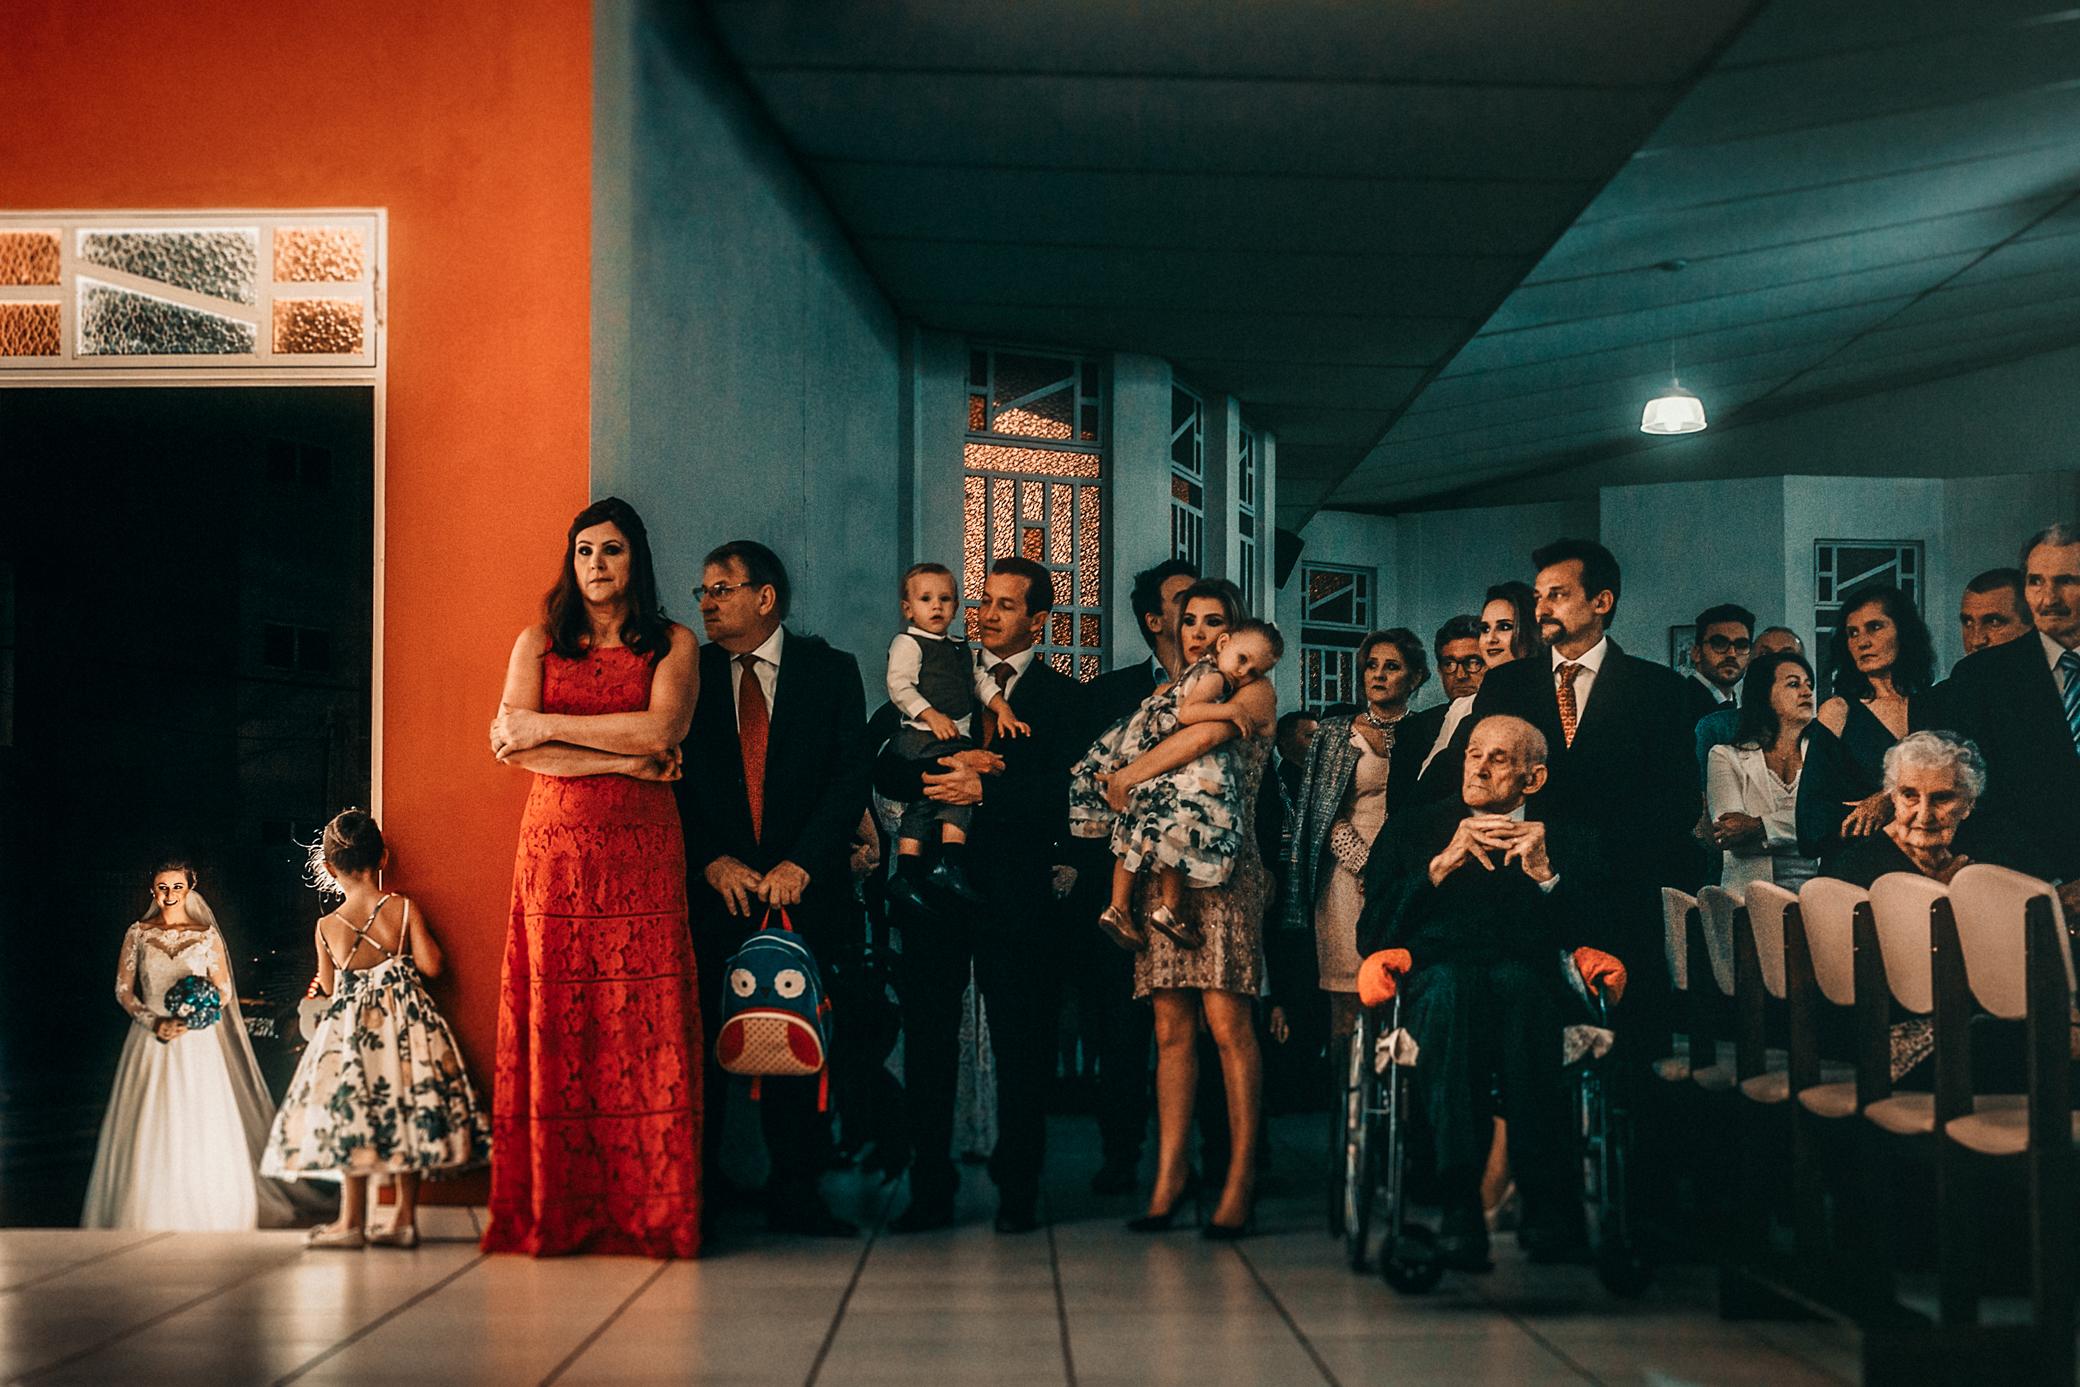 Photo © Gustavo Franco